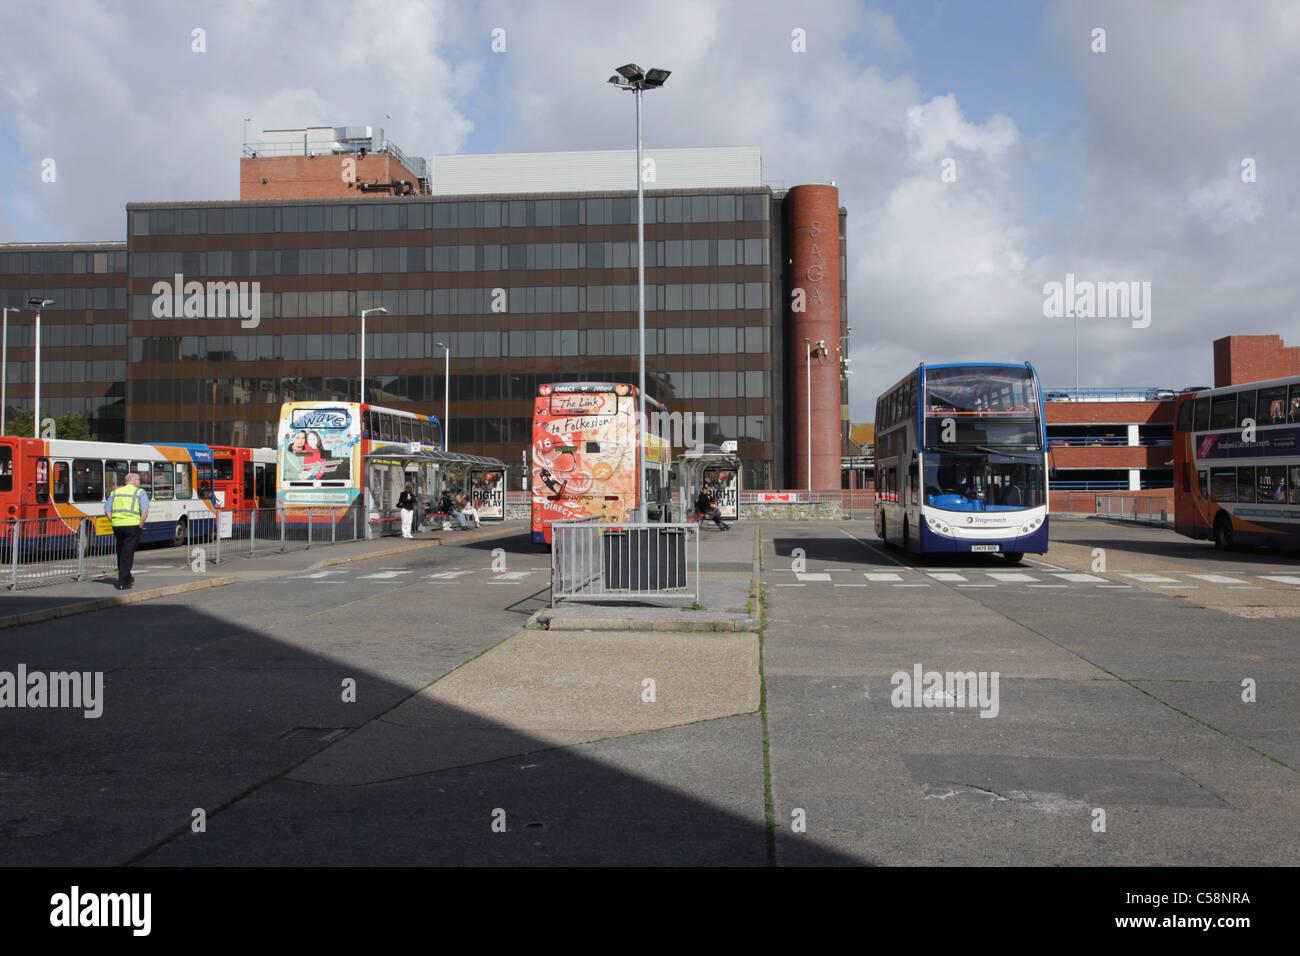 Folkestone Bus Station and Saga Building - Stock Image